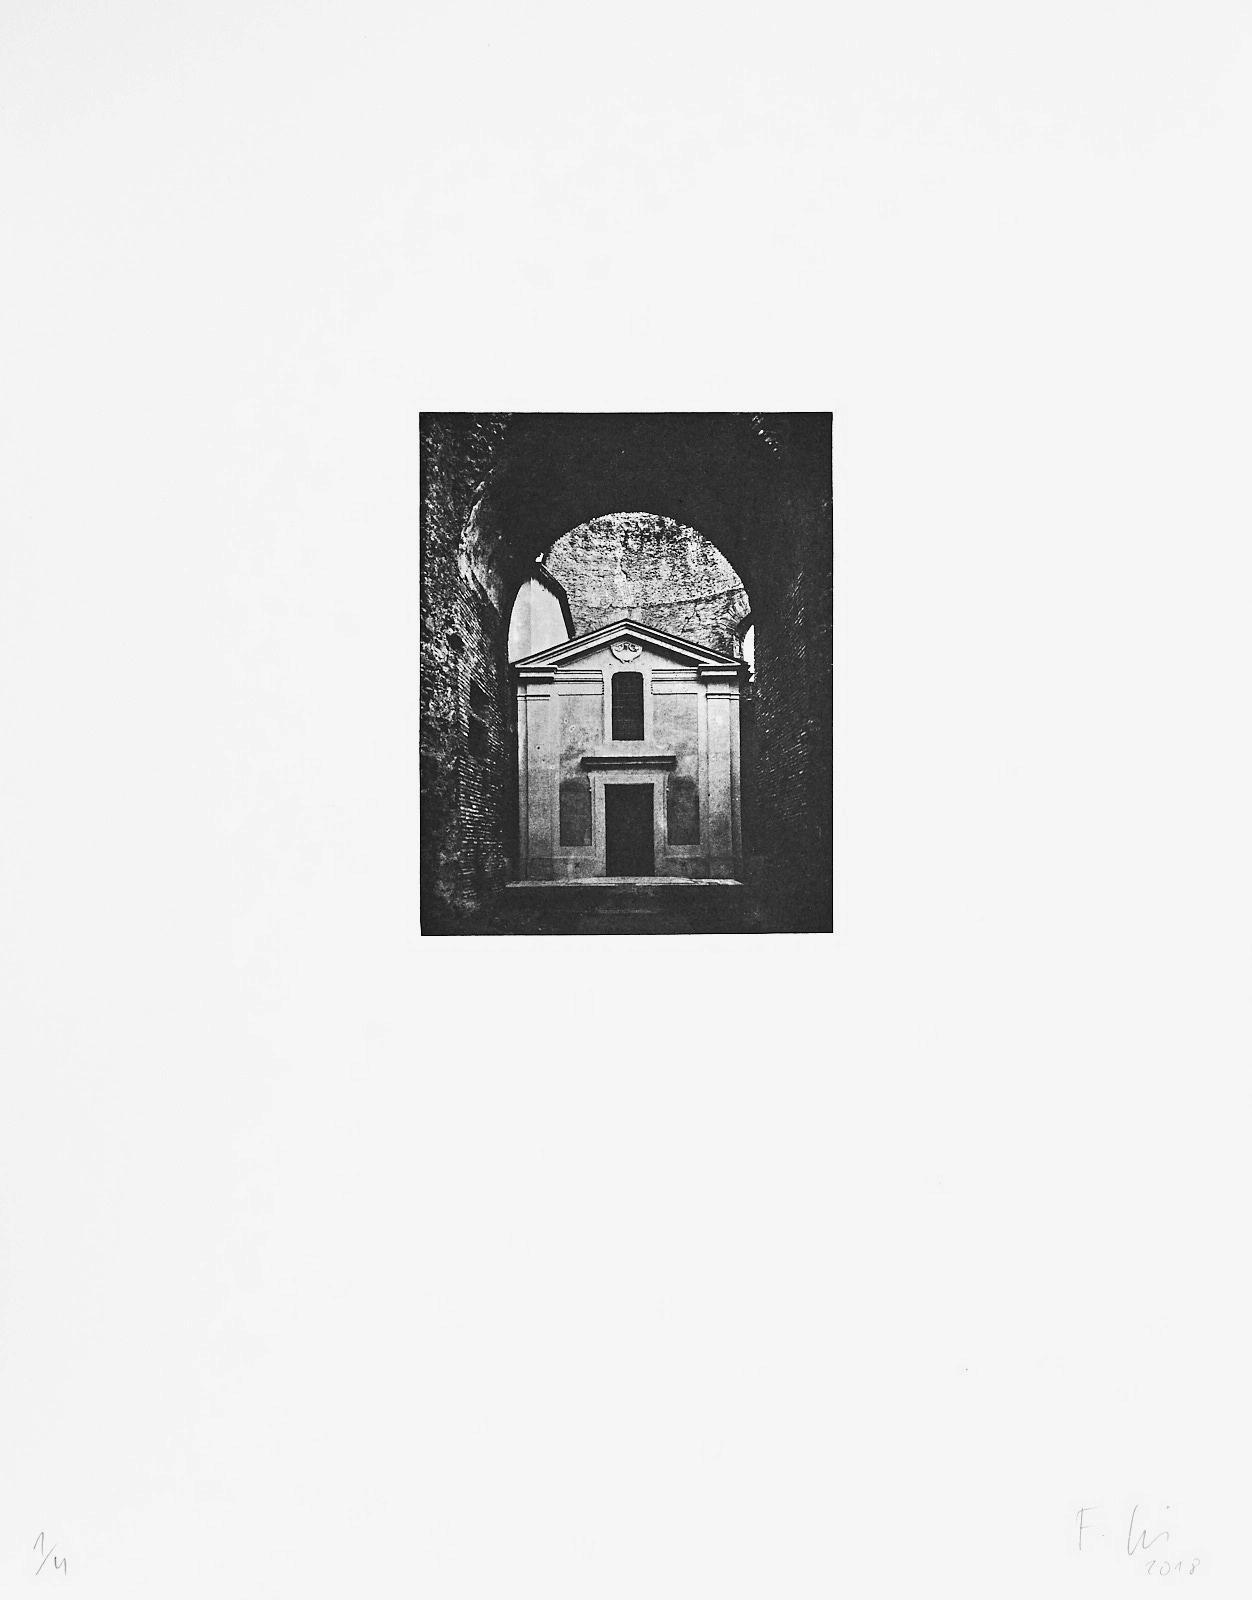 o.T.[Typologien#6]  (2018)  medium: Photogravure  size: 36 x 46 cm  paper: Zerkall 270 g/qm  plate: 11.7 x 14.7 cm  edition: 6 copies  numbered: 1/4 - 4/4, 2 e.a.  printer: FWU